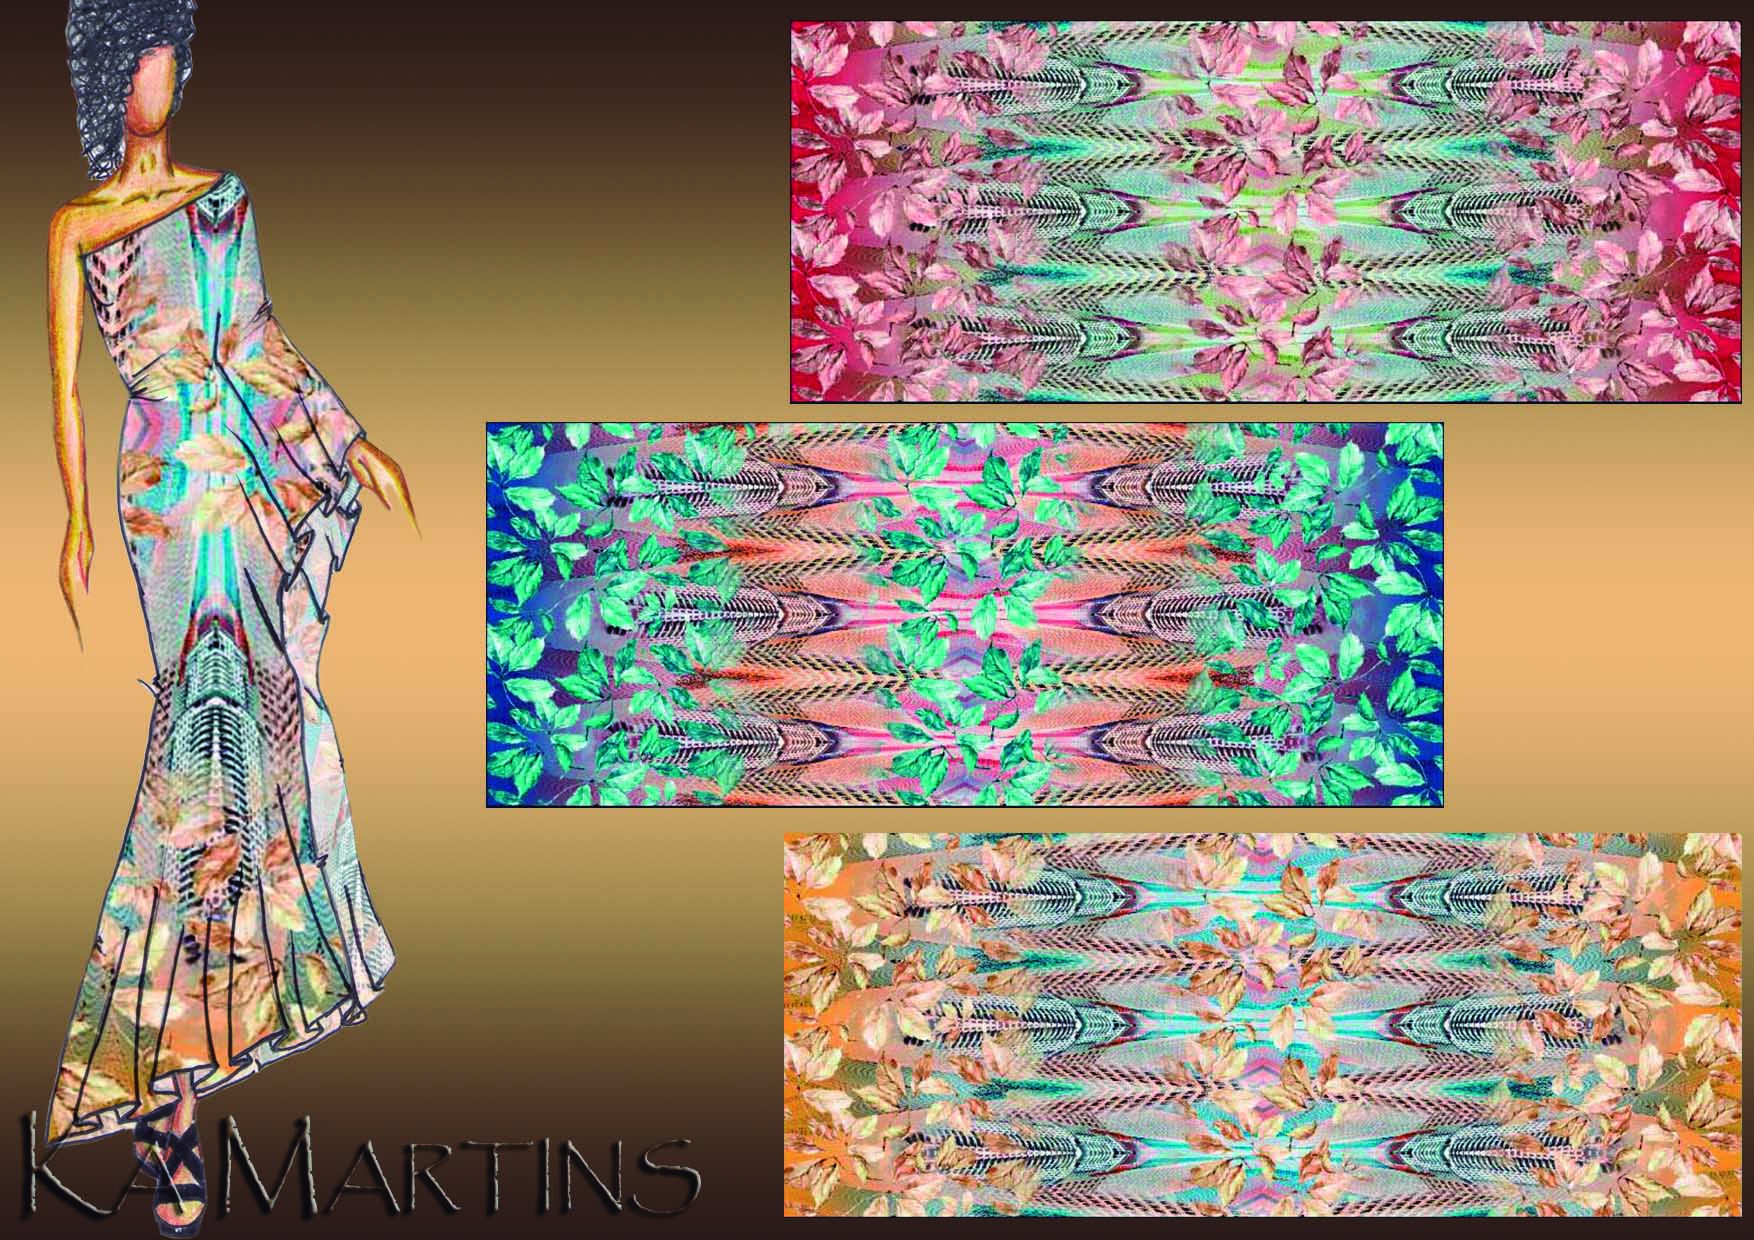 Prédios - Estampa colorida por Ká Martins para Natan Tecidos.